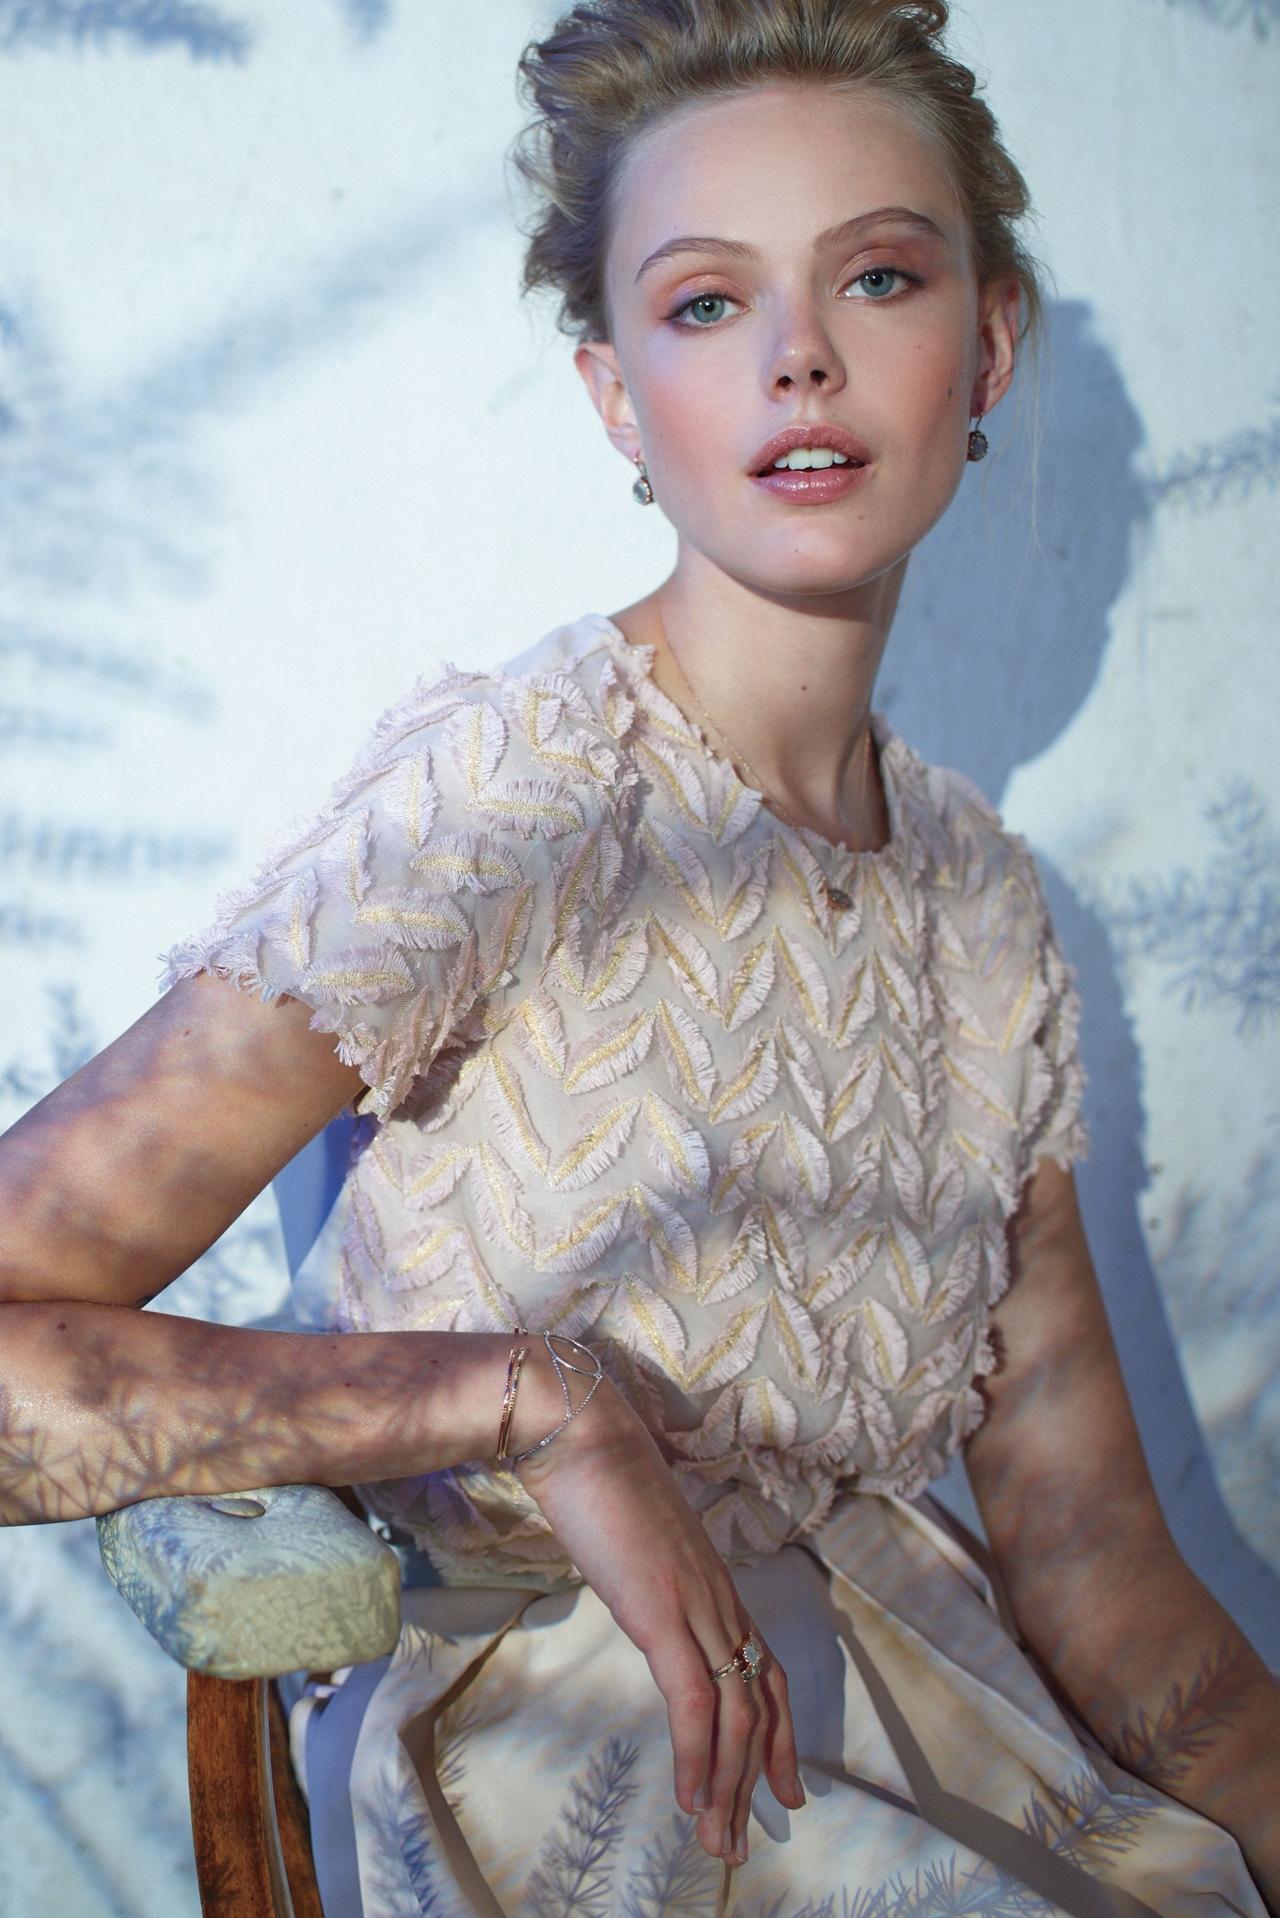 c88ef4144f5c Anthropologie Fall 2014 :: Frida Gustavsson | MITH Magazine